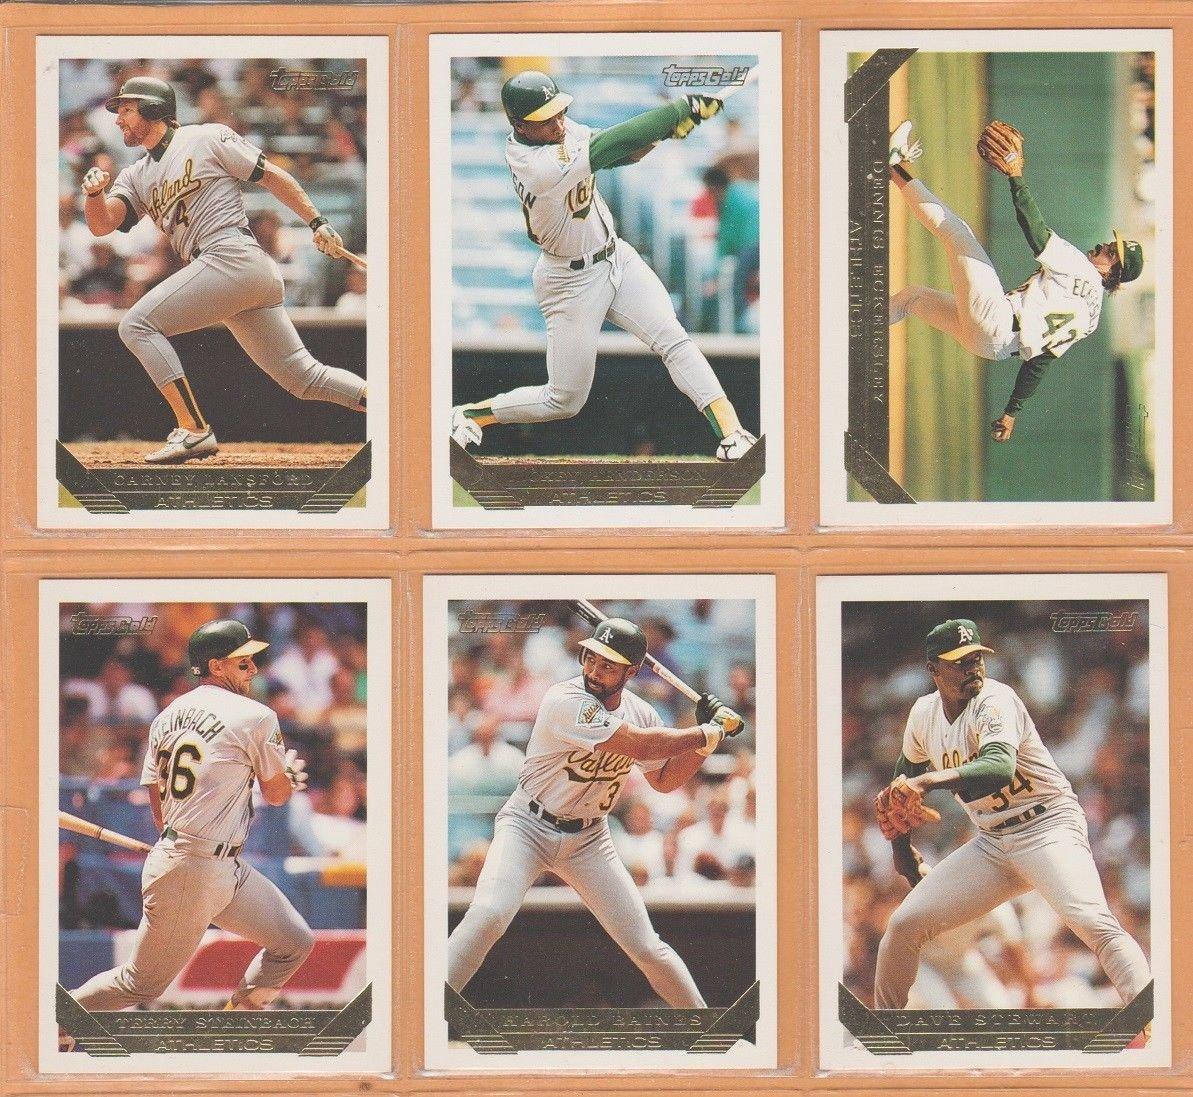 1993 Topps Gold Insert Oakland Athletics Team Lot 25 Rickey Henderson Dennis Eckersley Harold Baines